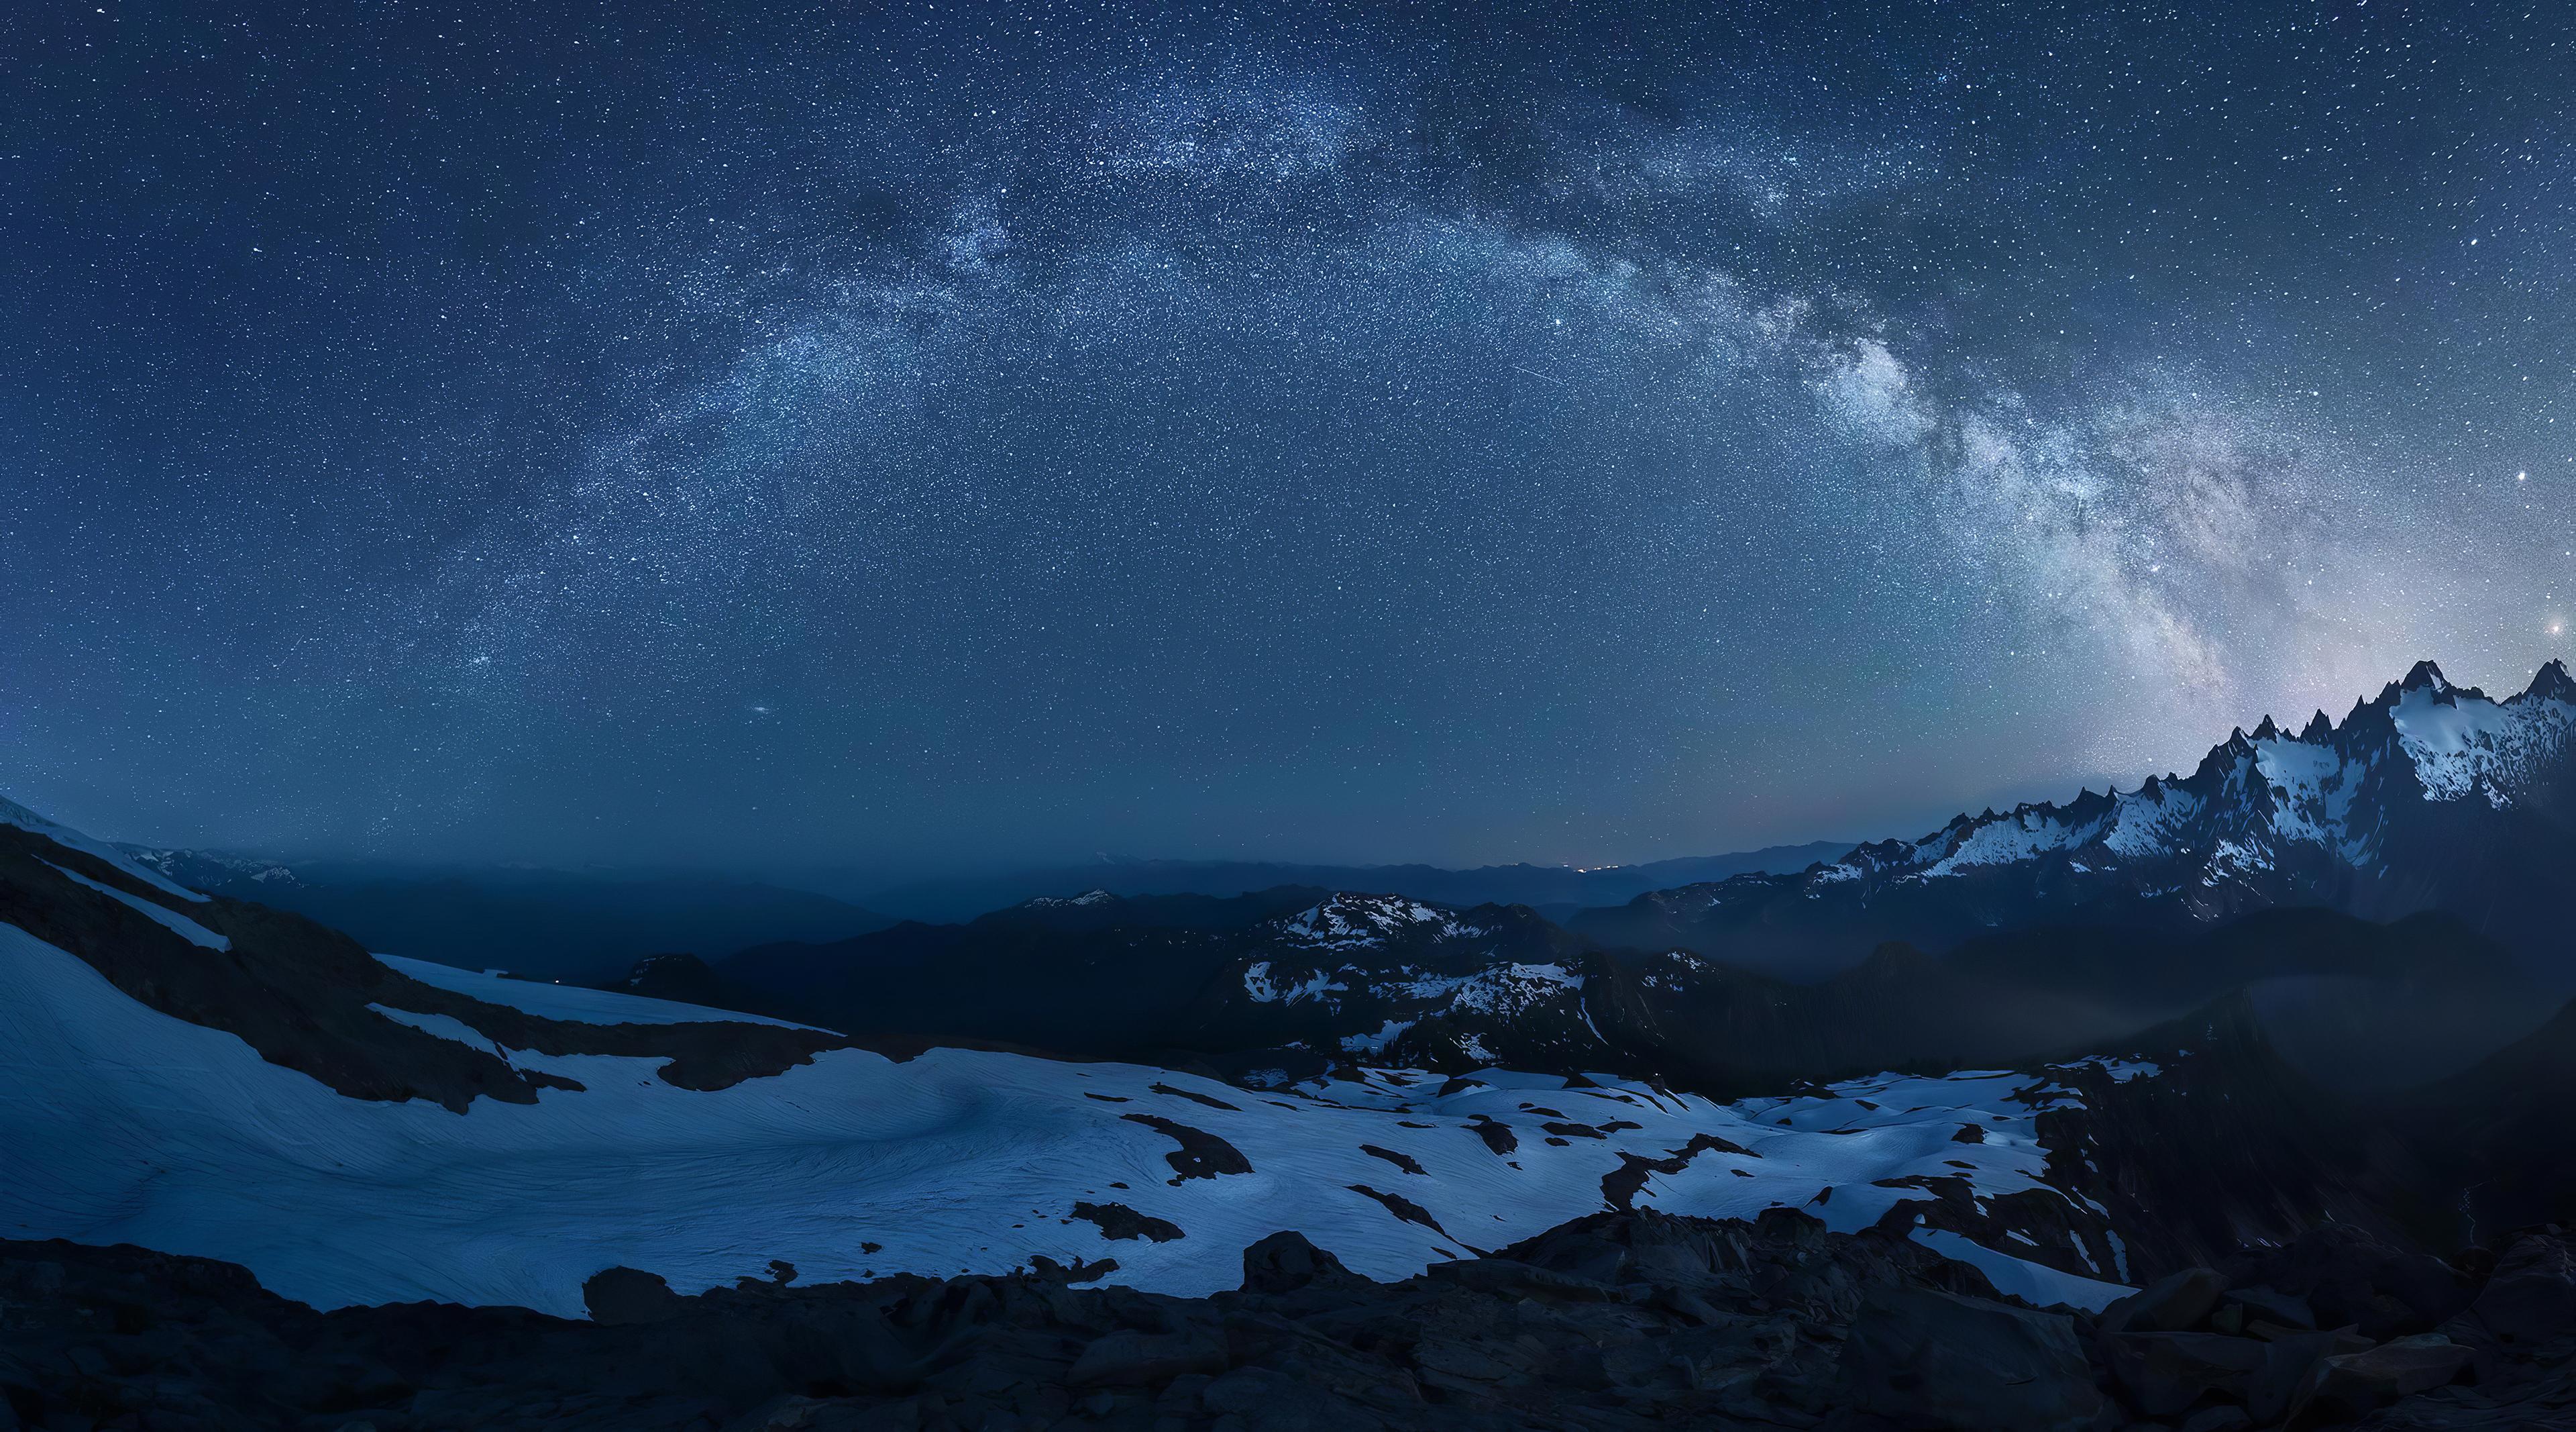 milky way looking south 1574937369 - Milky Way Looking South -